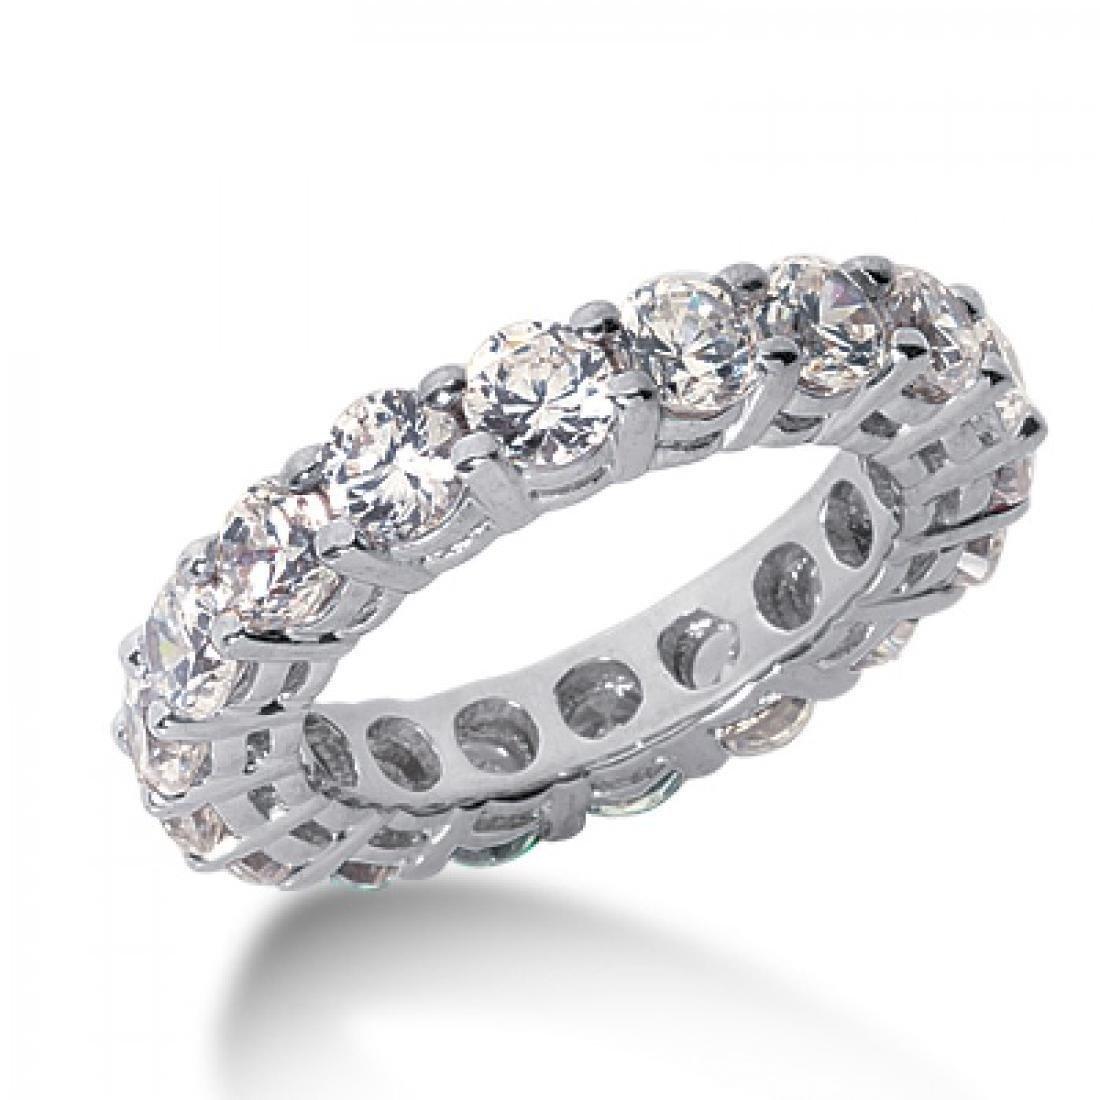 14K White Gold Diamond Eternity Band Ring, 2.22ct